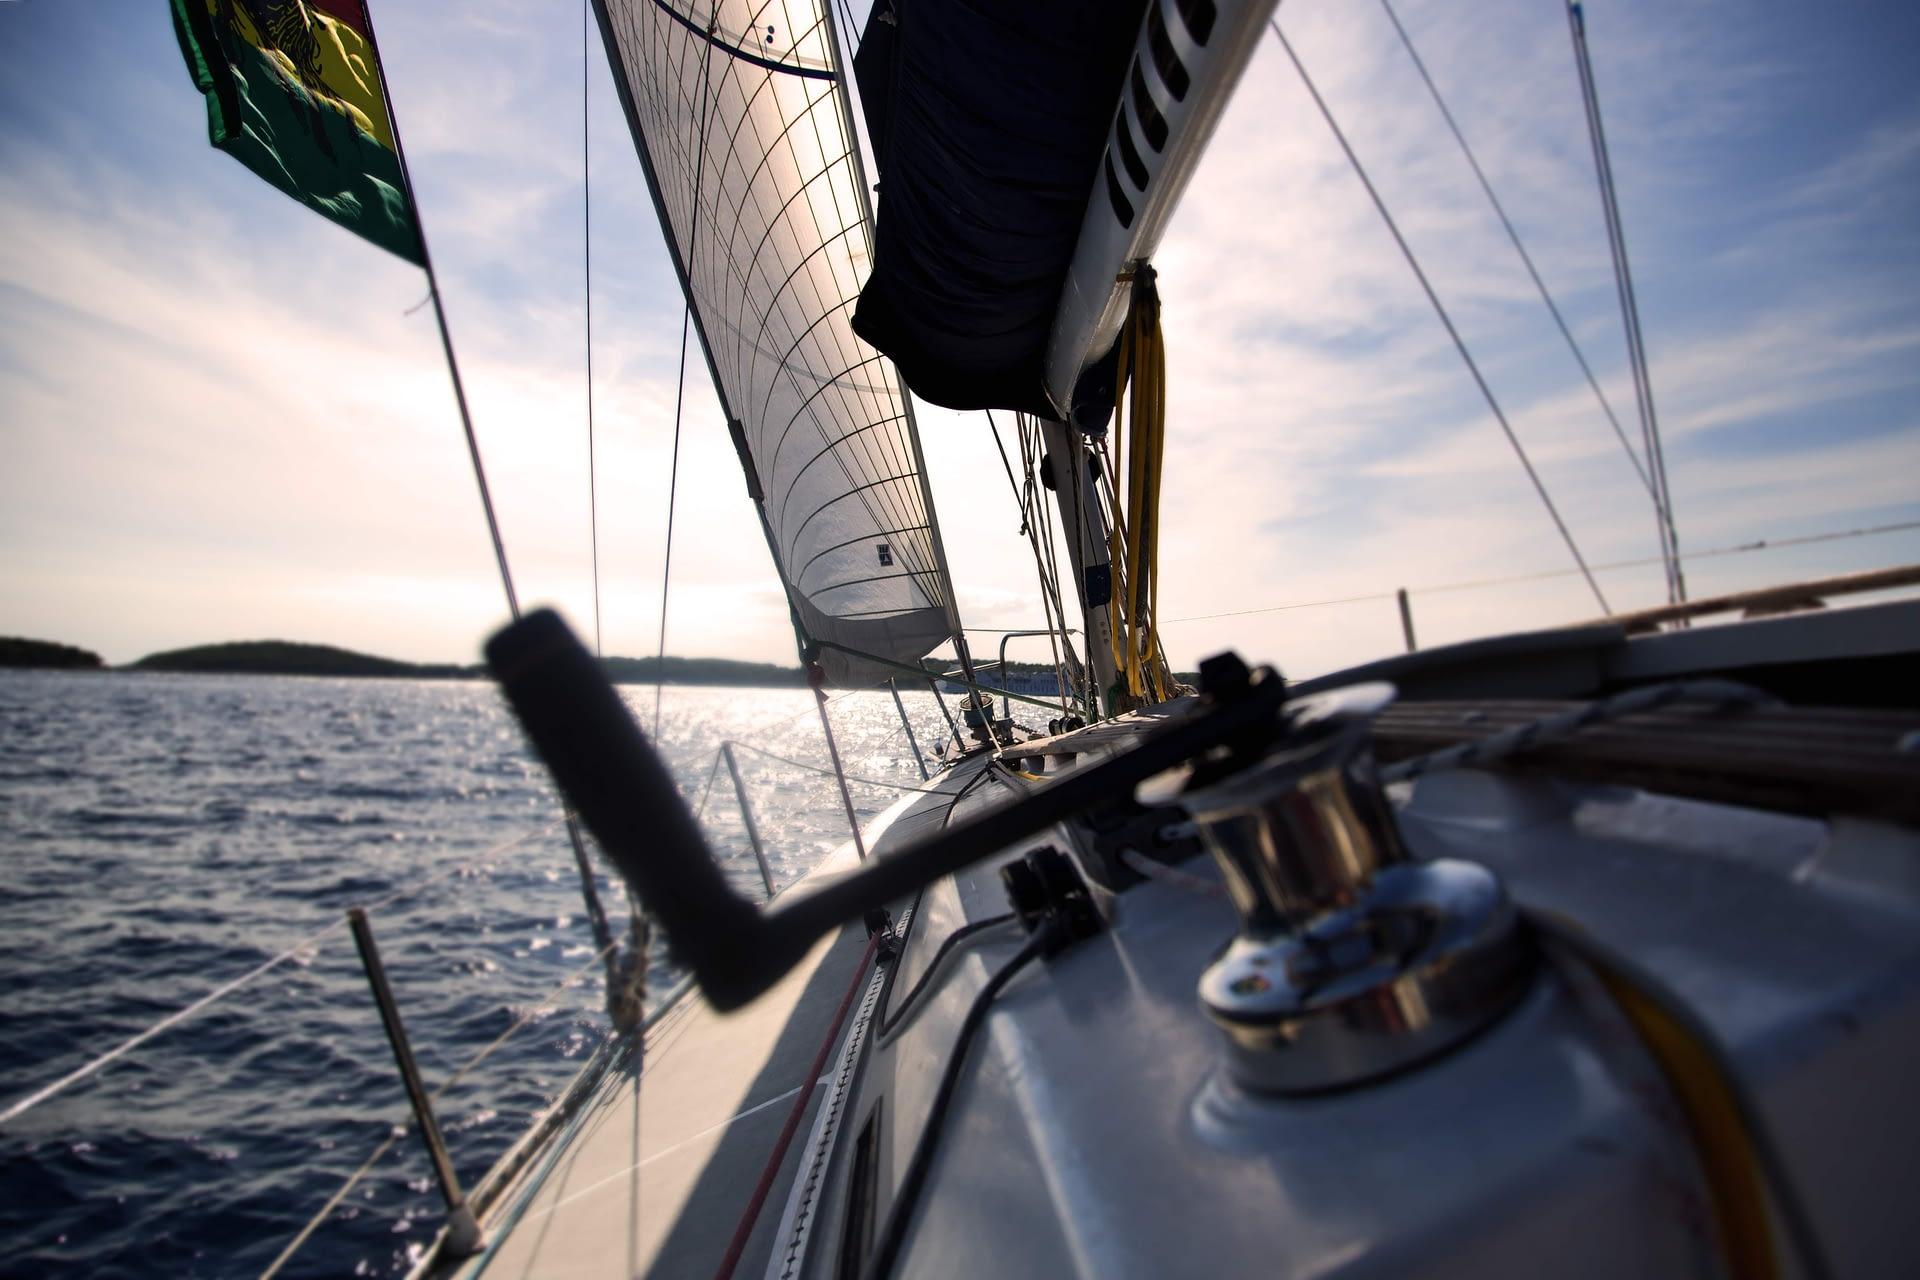 RYA Day skipper course Croatia Sailing Holidays learn to sail